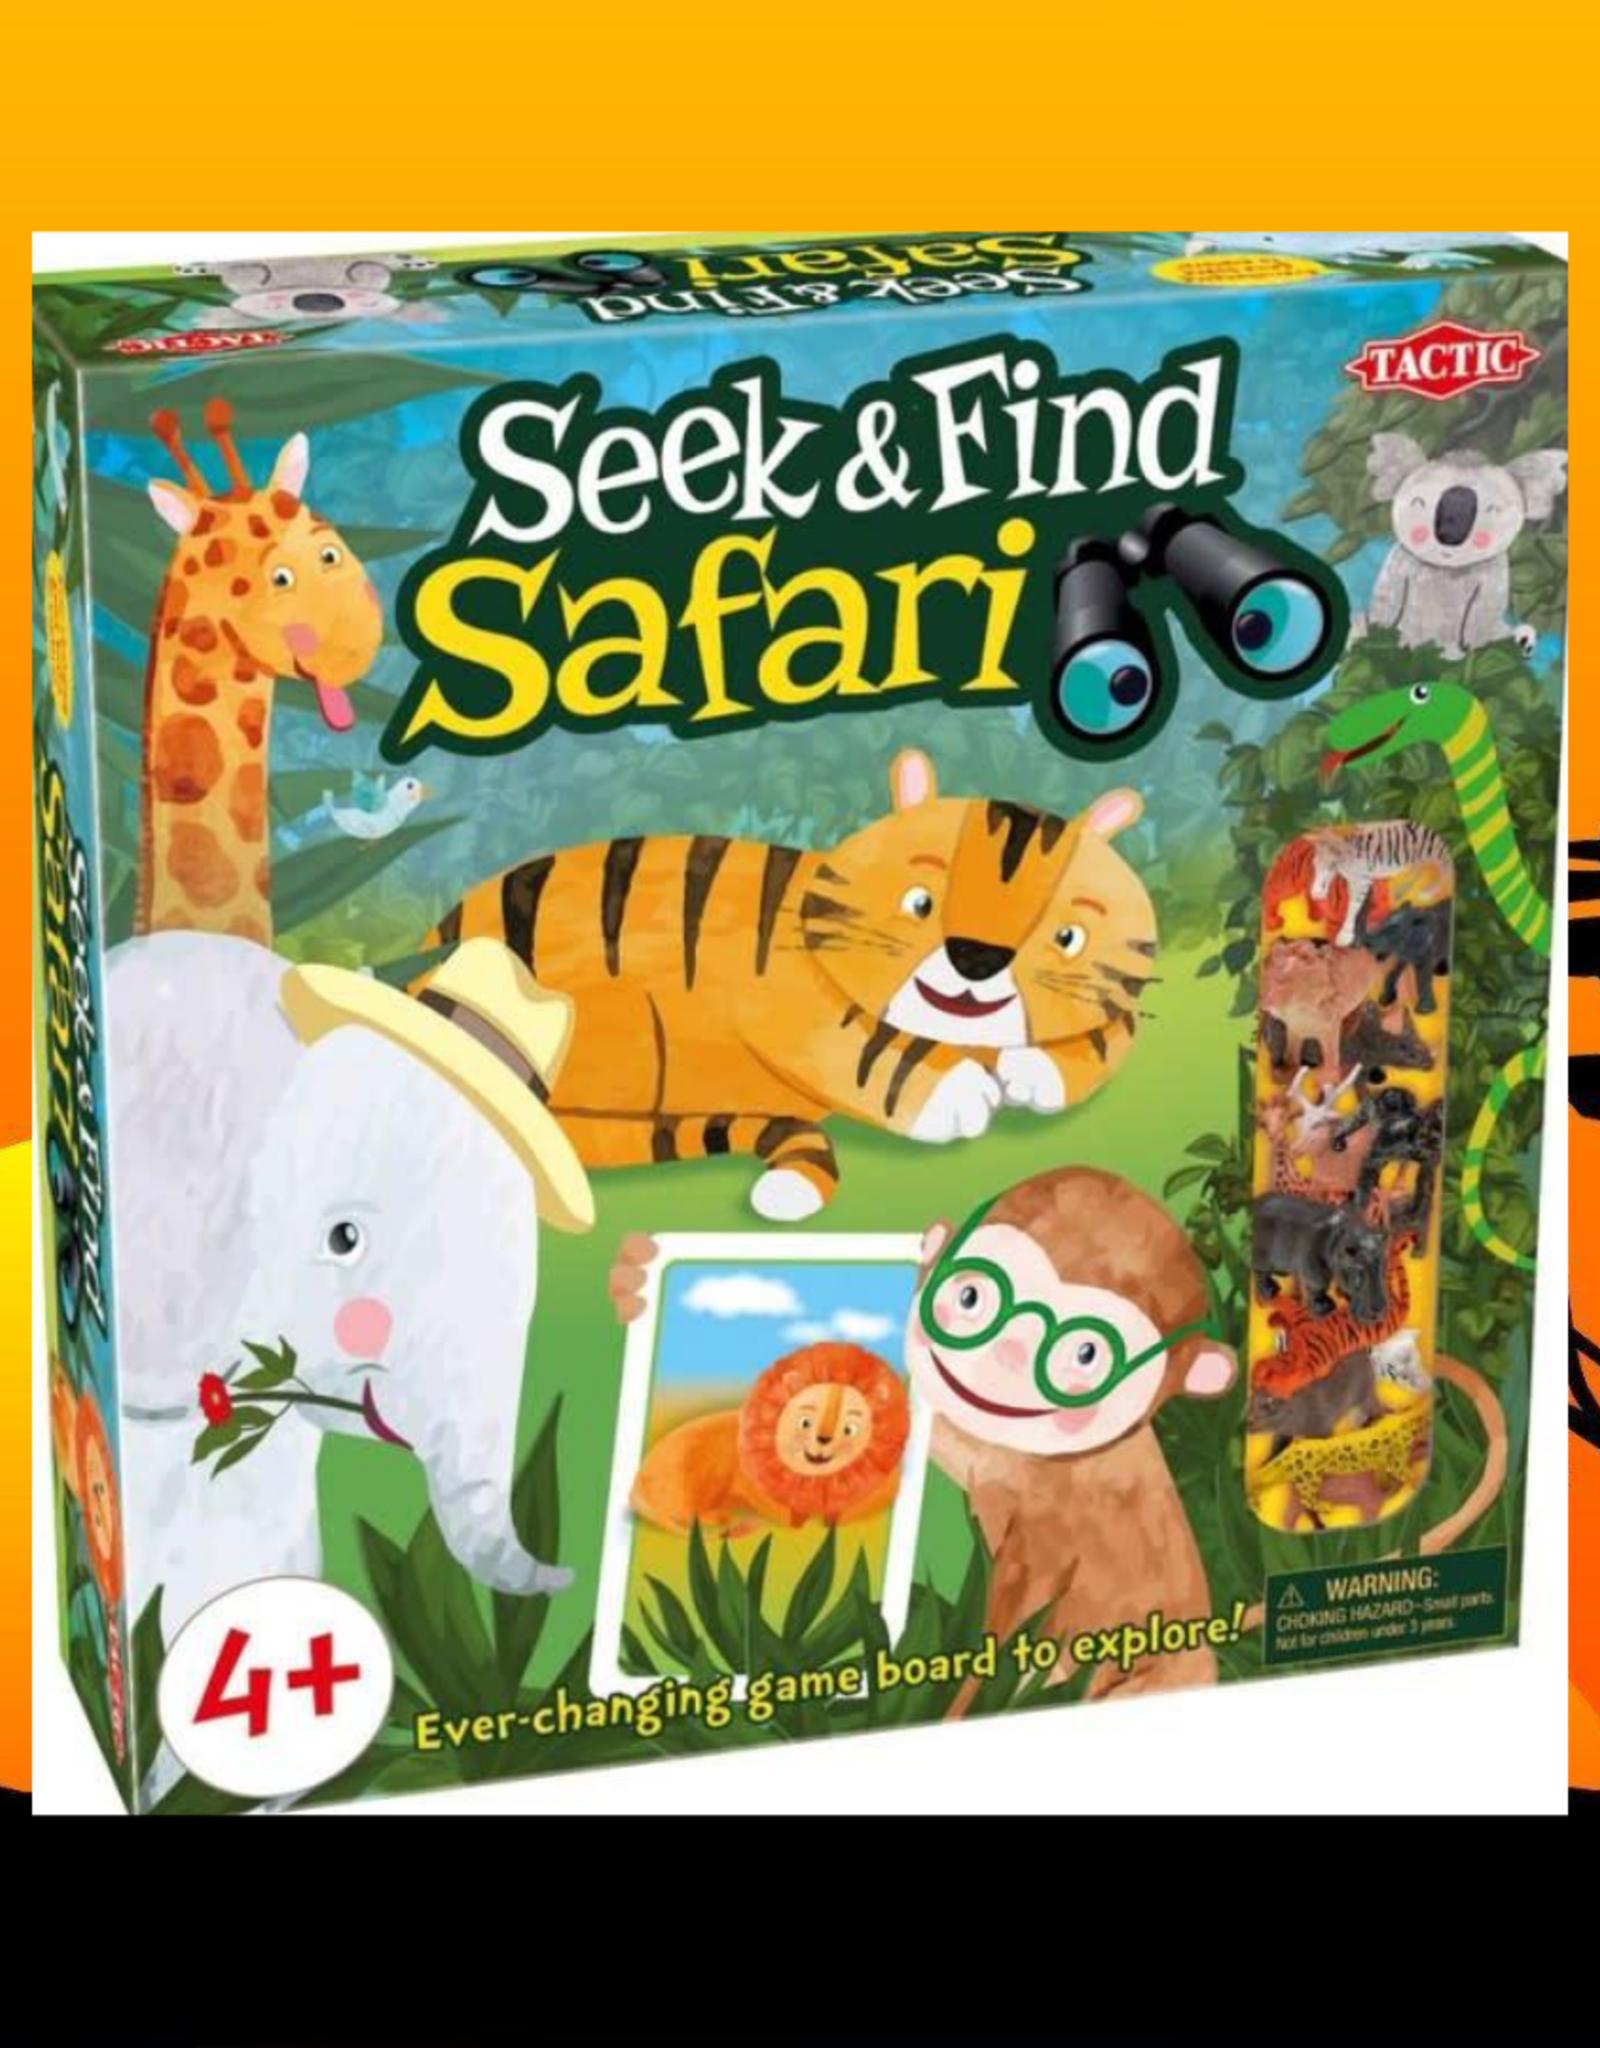 SEEK AND FIND SAFARI